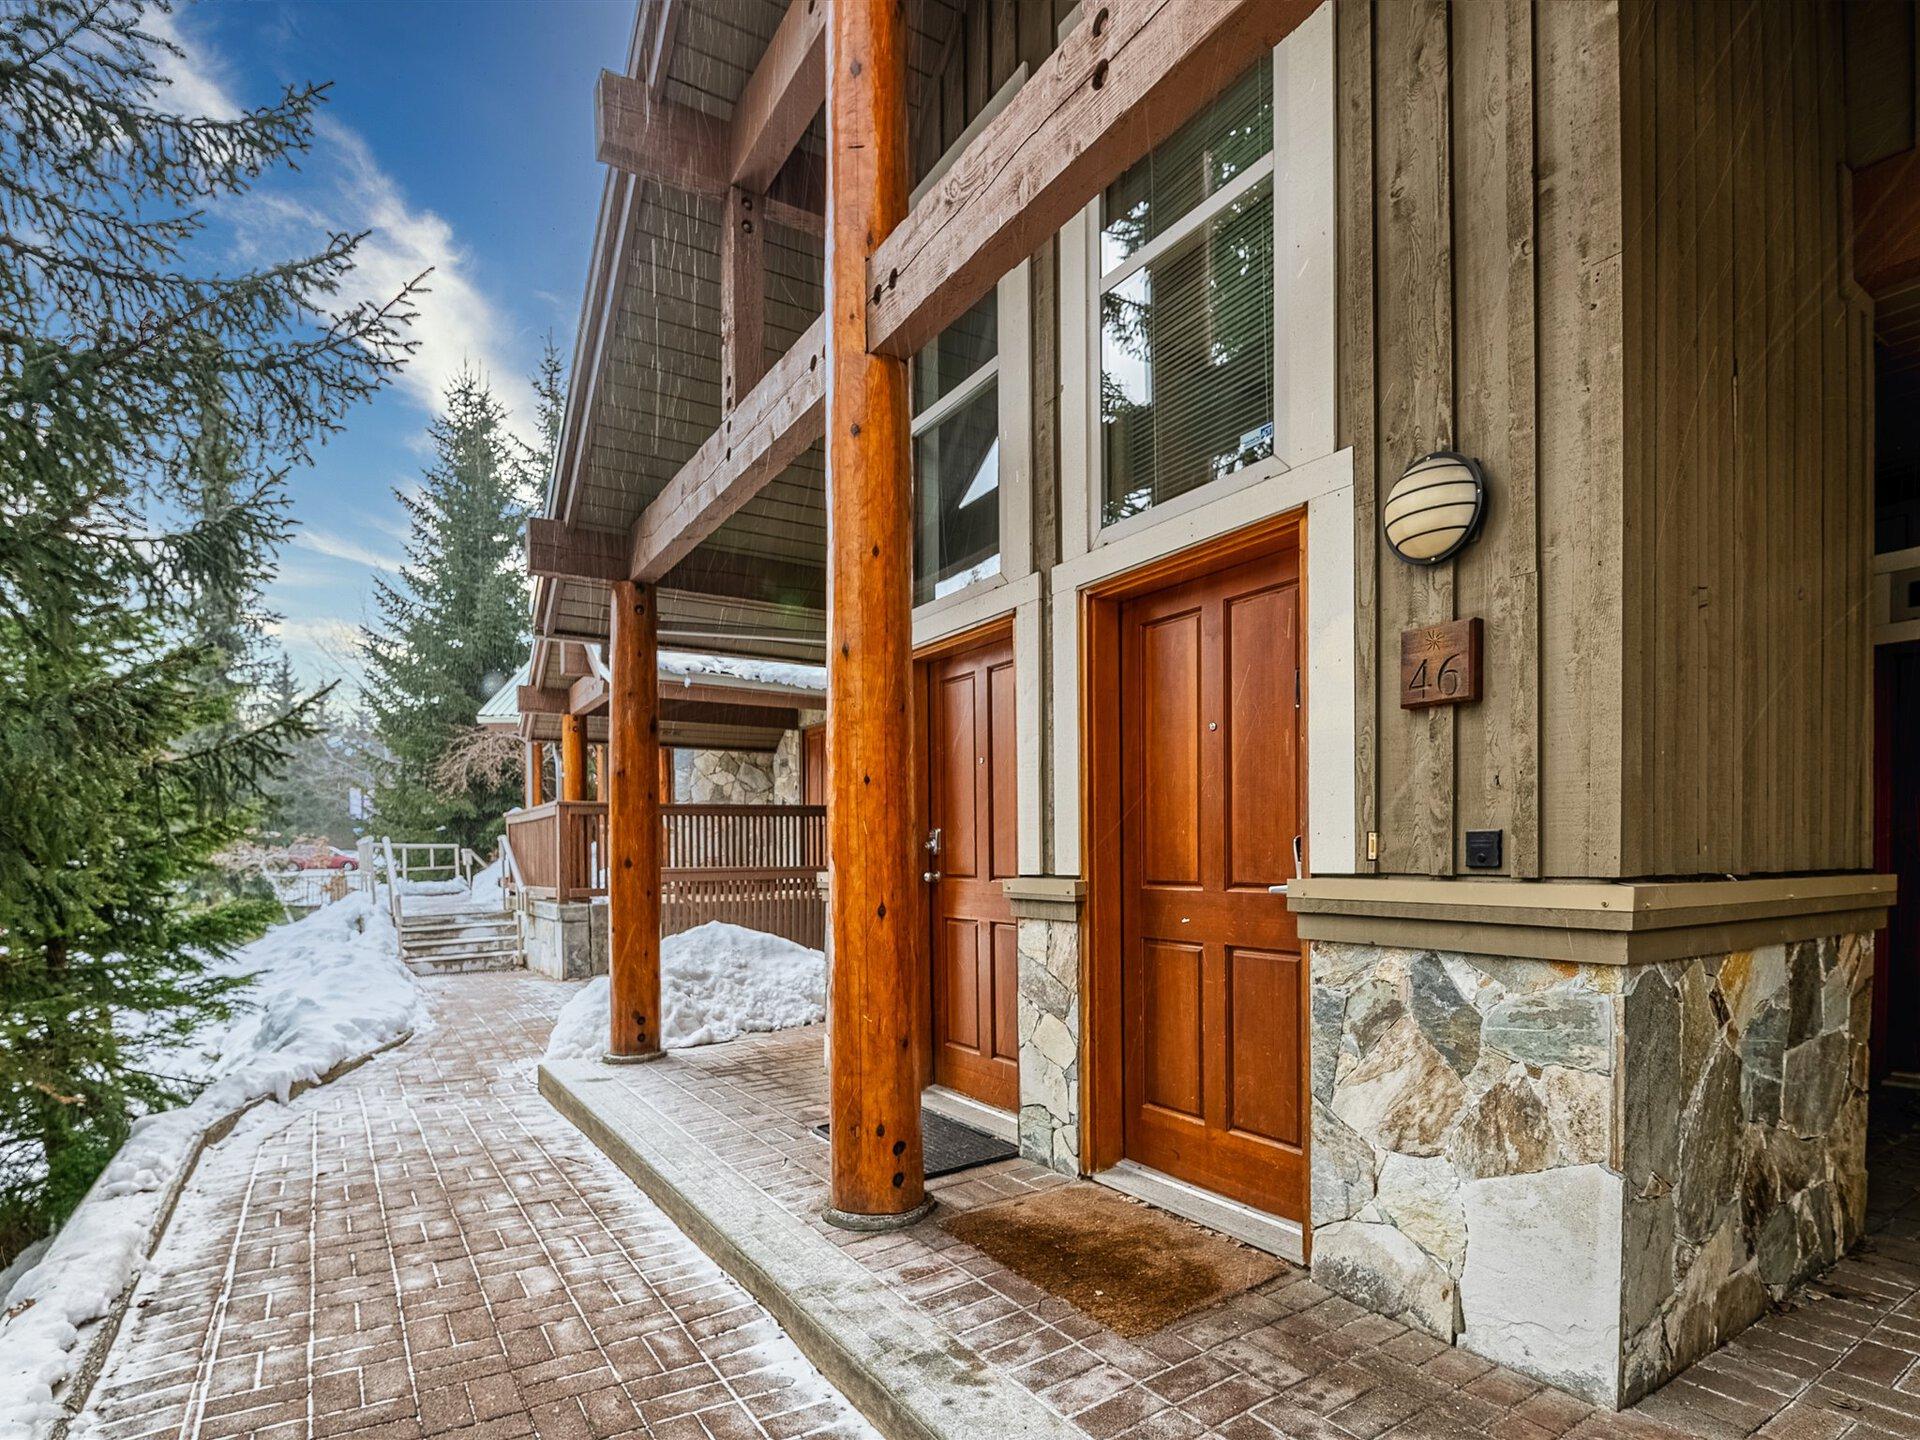 02-46-4385-northlands-blvd-02 at 46 - 4385 Northlands Boulevard, Whistler Village, Whistler